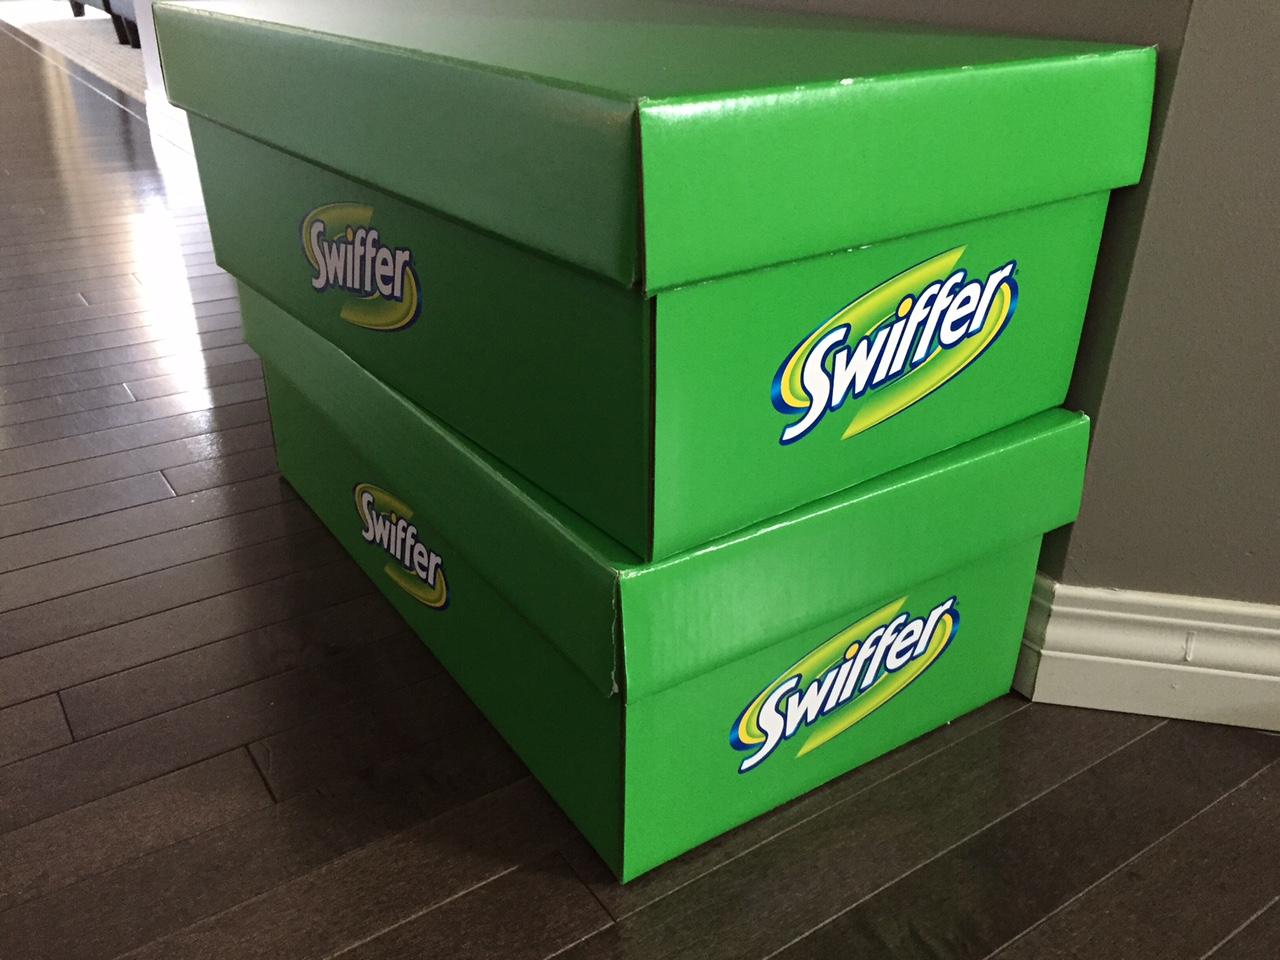 Swiffer boxes!